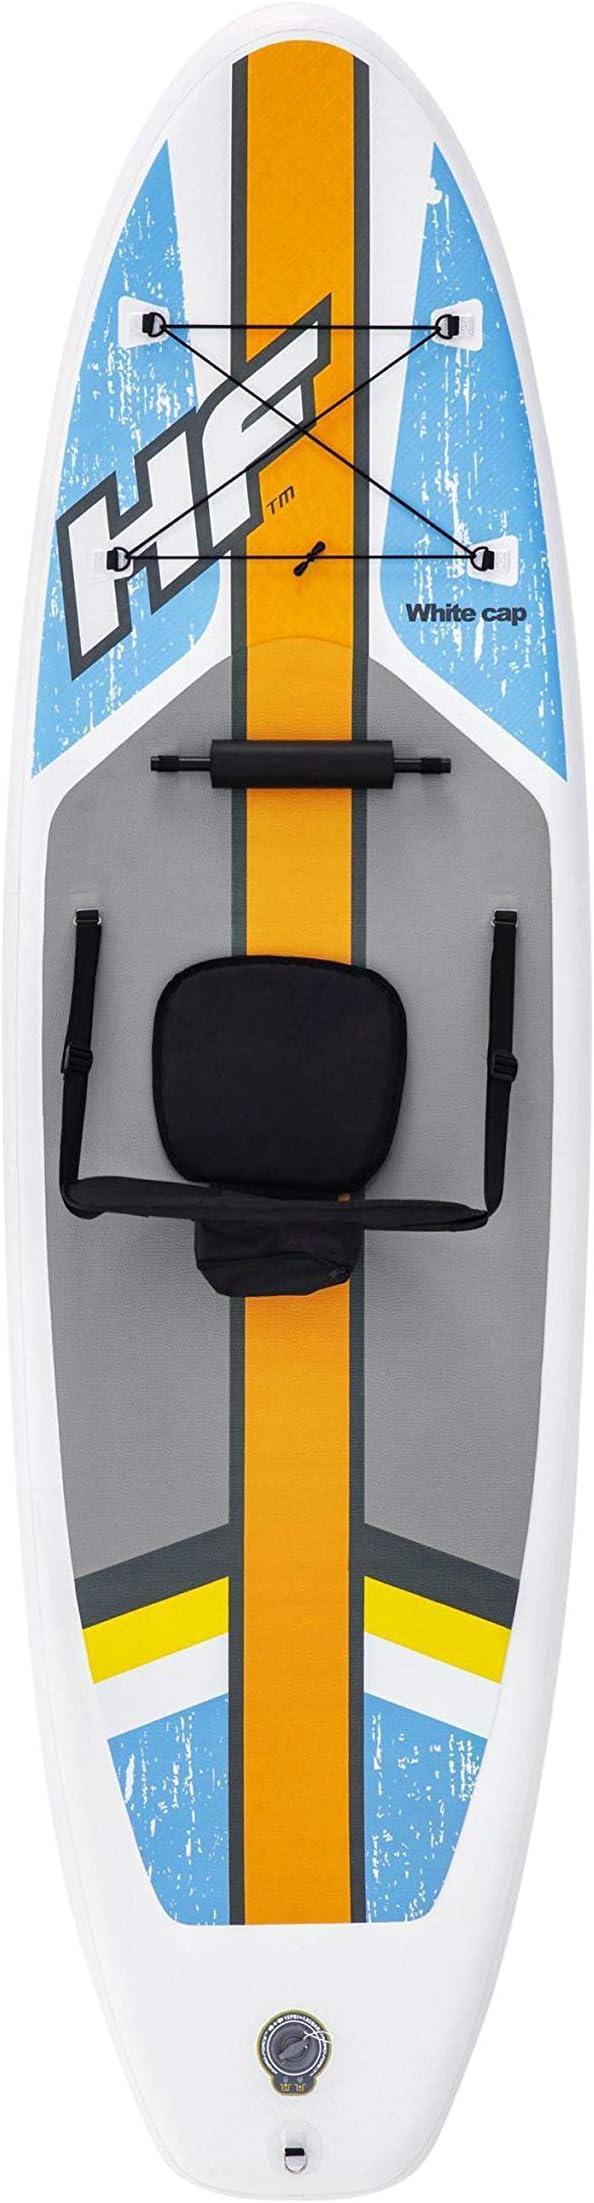 Paddle gonflable SUP et kayak White Cap 305 x 81 x 10 cm